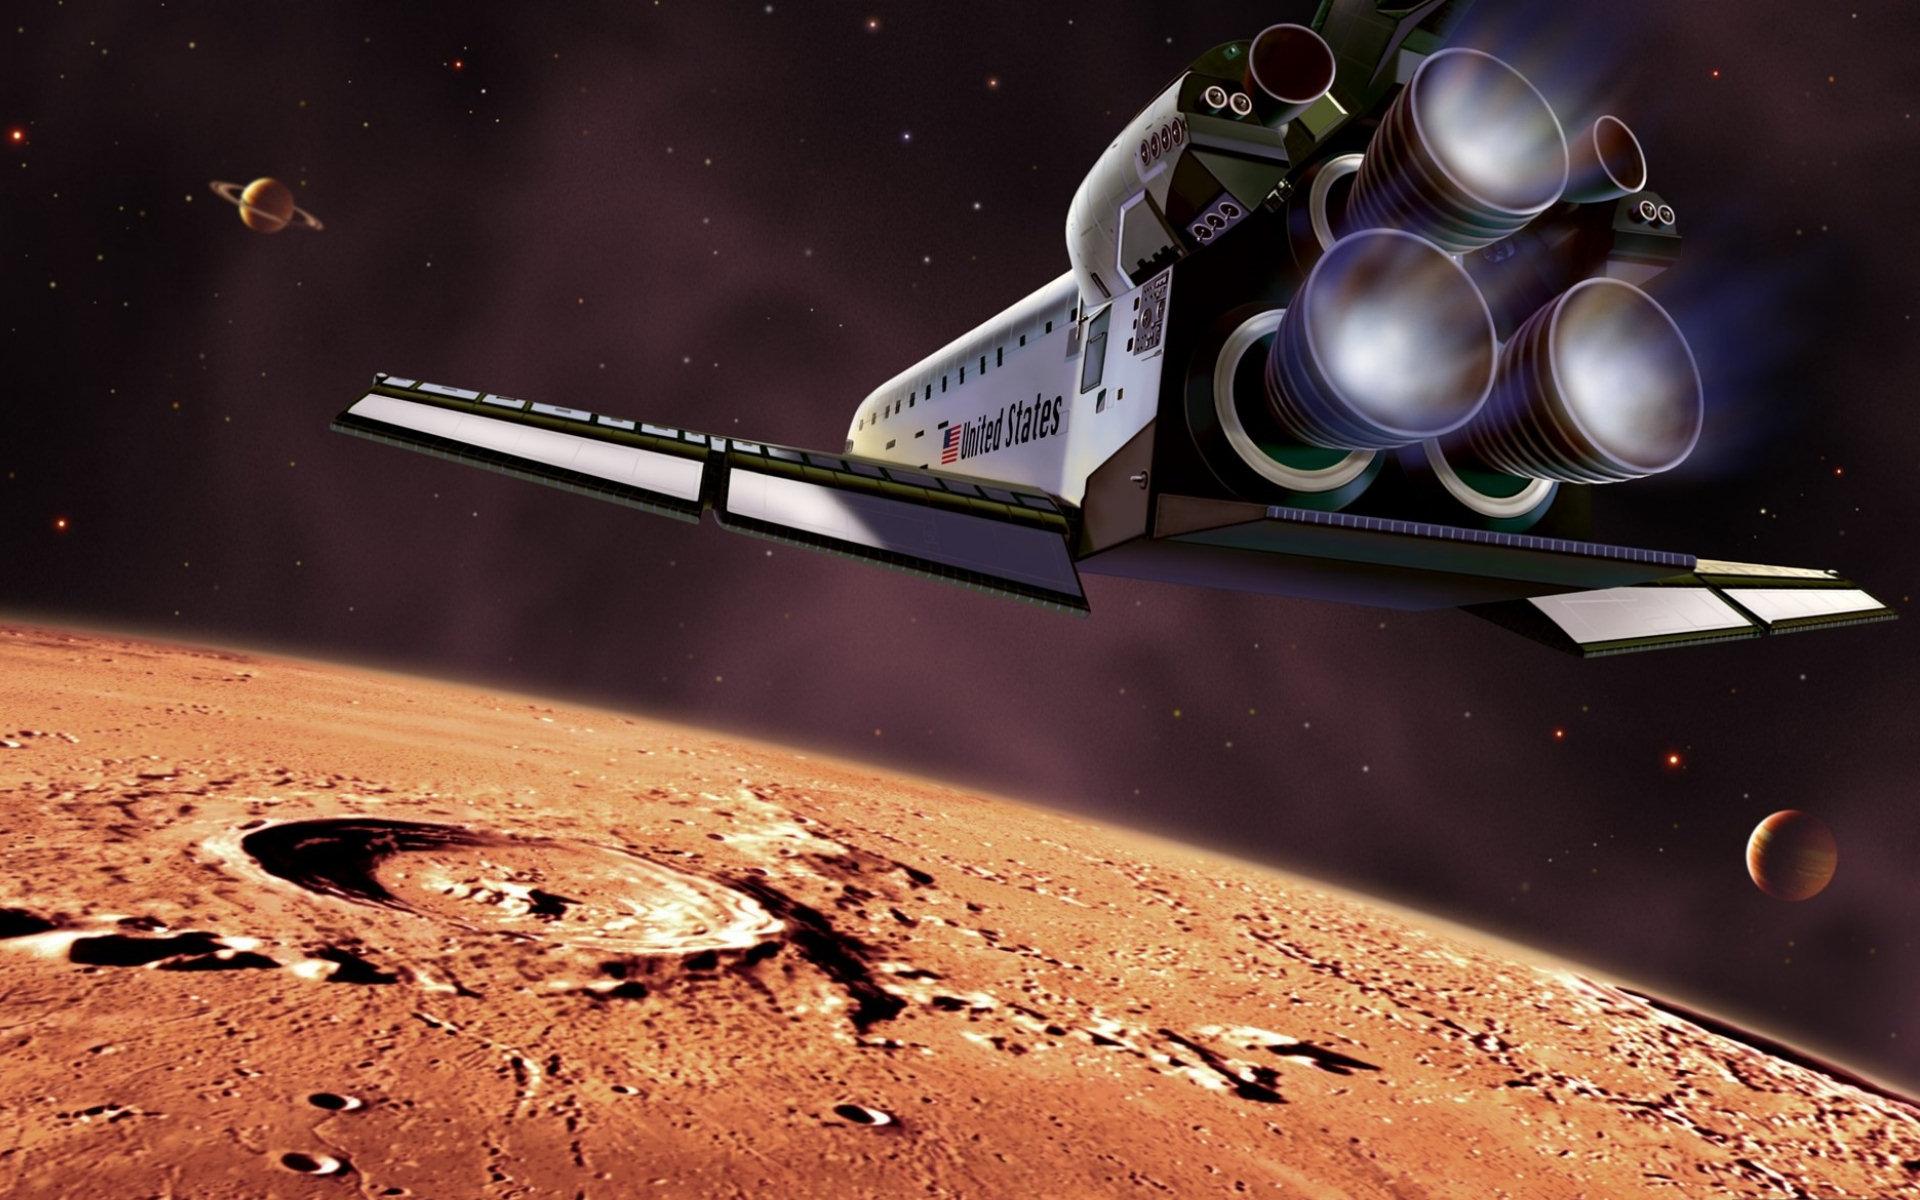 Nasa Iphone 5 Wallpaper Space Exploration Hd Wallpaper Background Image